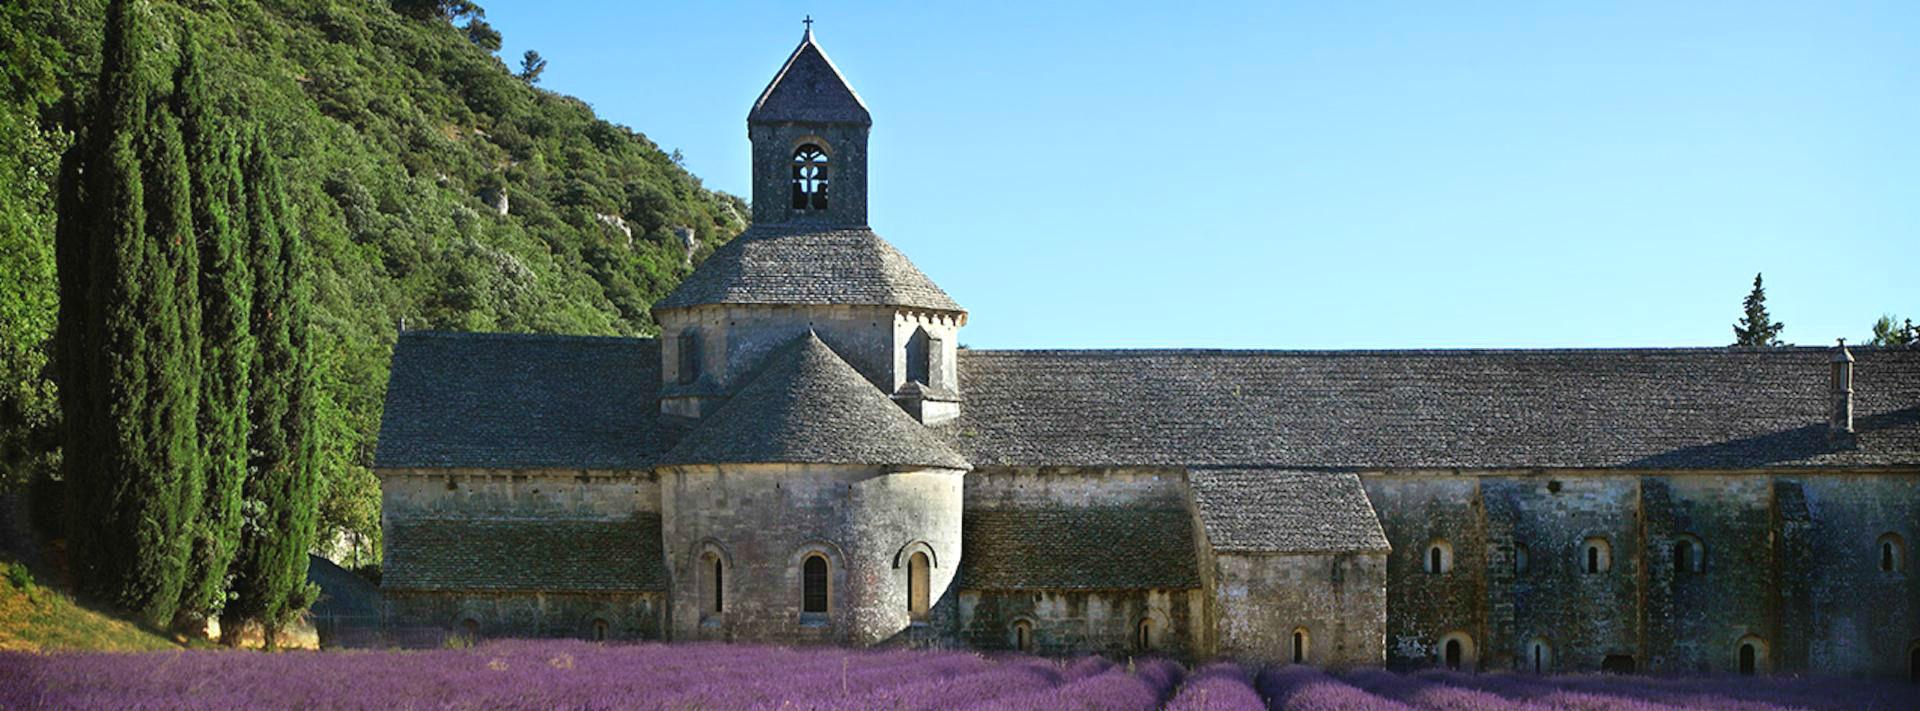 Sénanque, une abbaye en péril